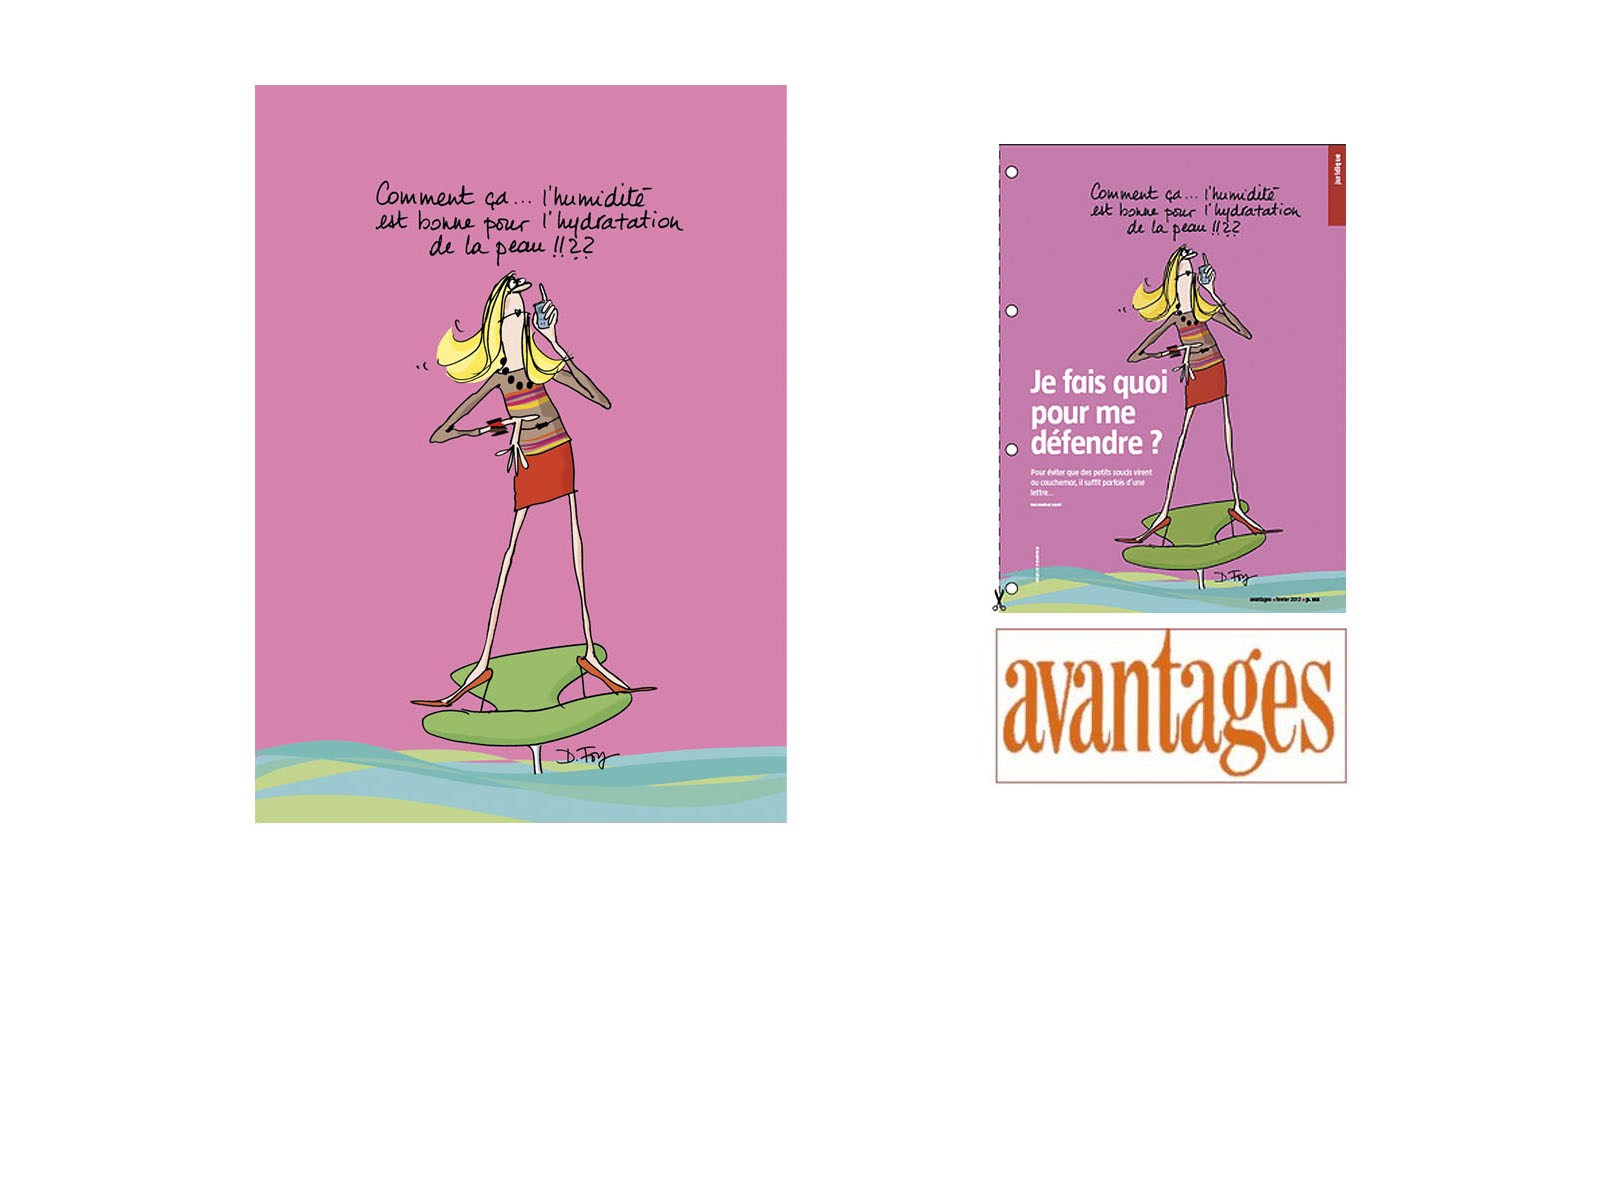 FOYDominique-Illustrations-4499